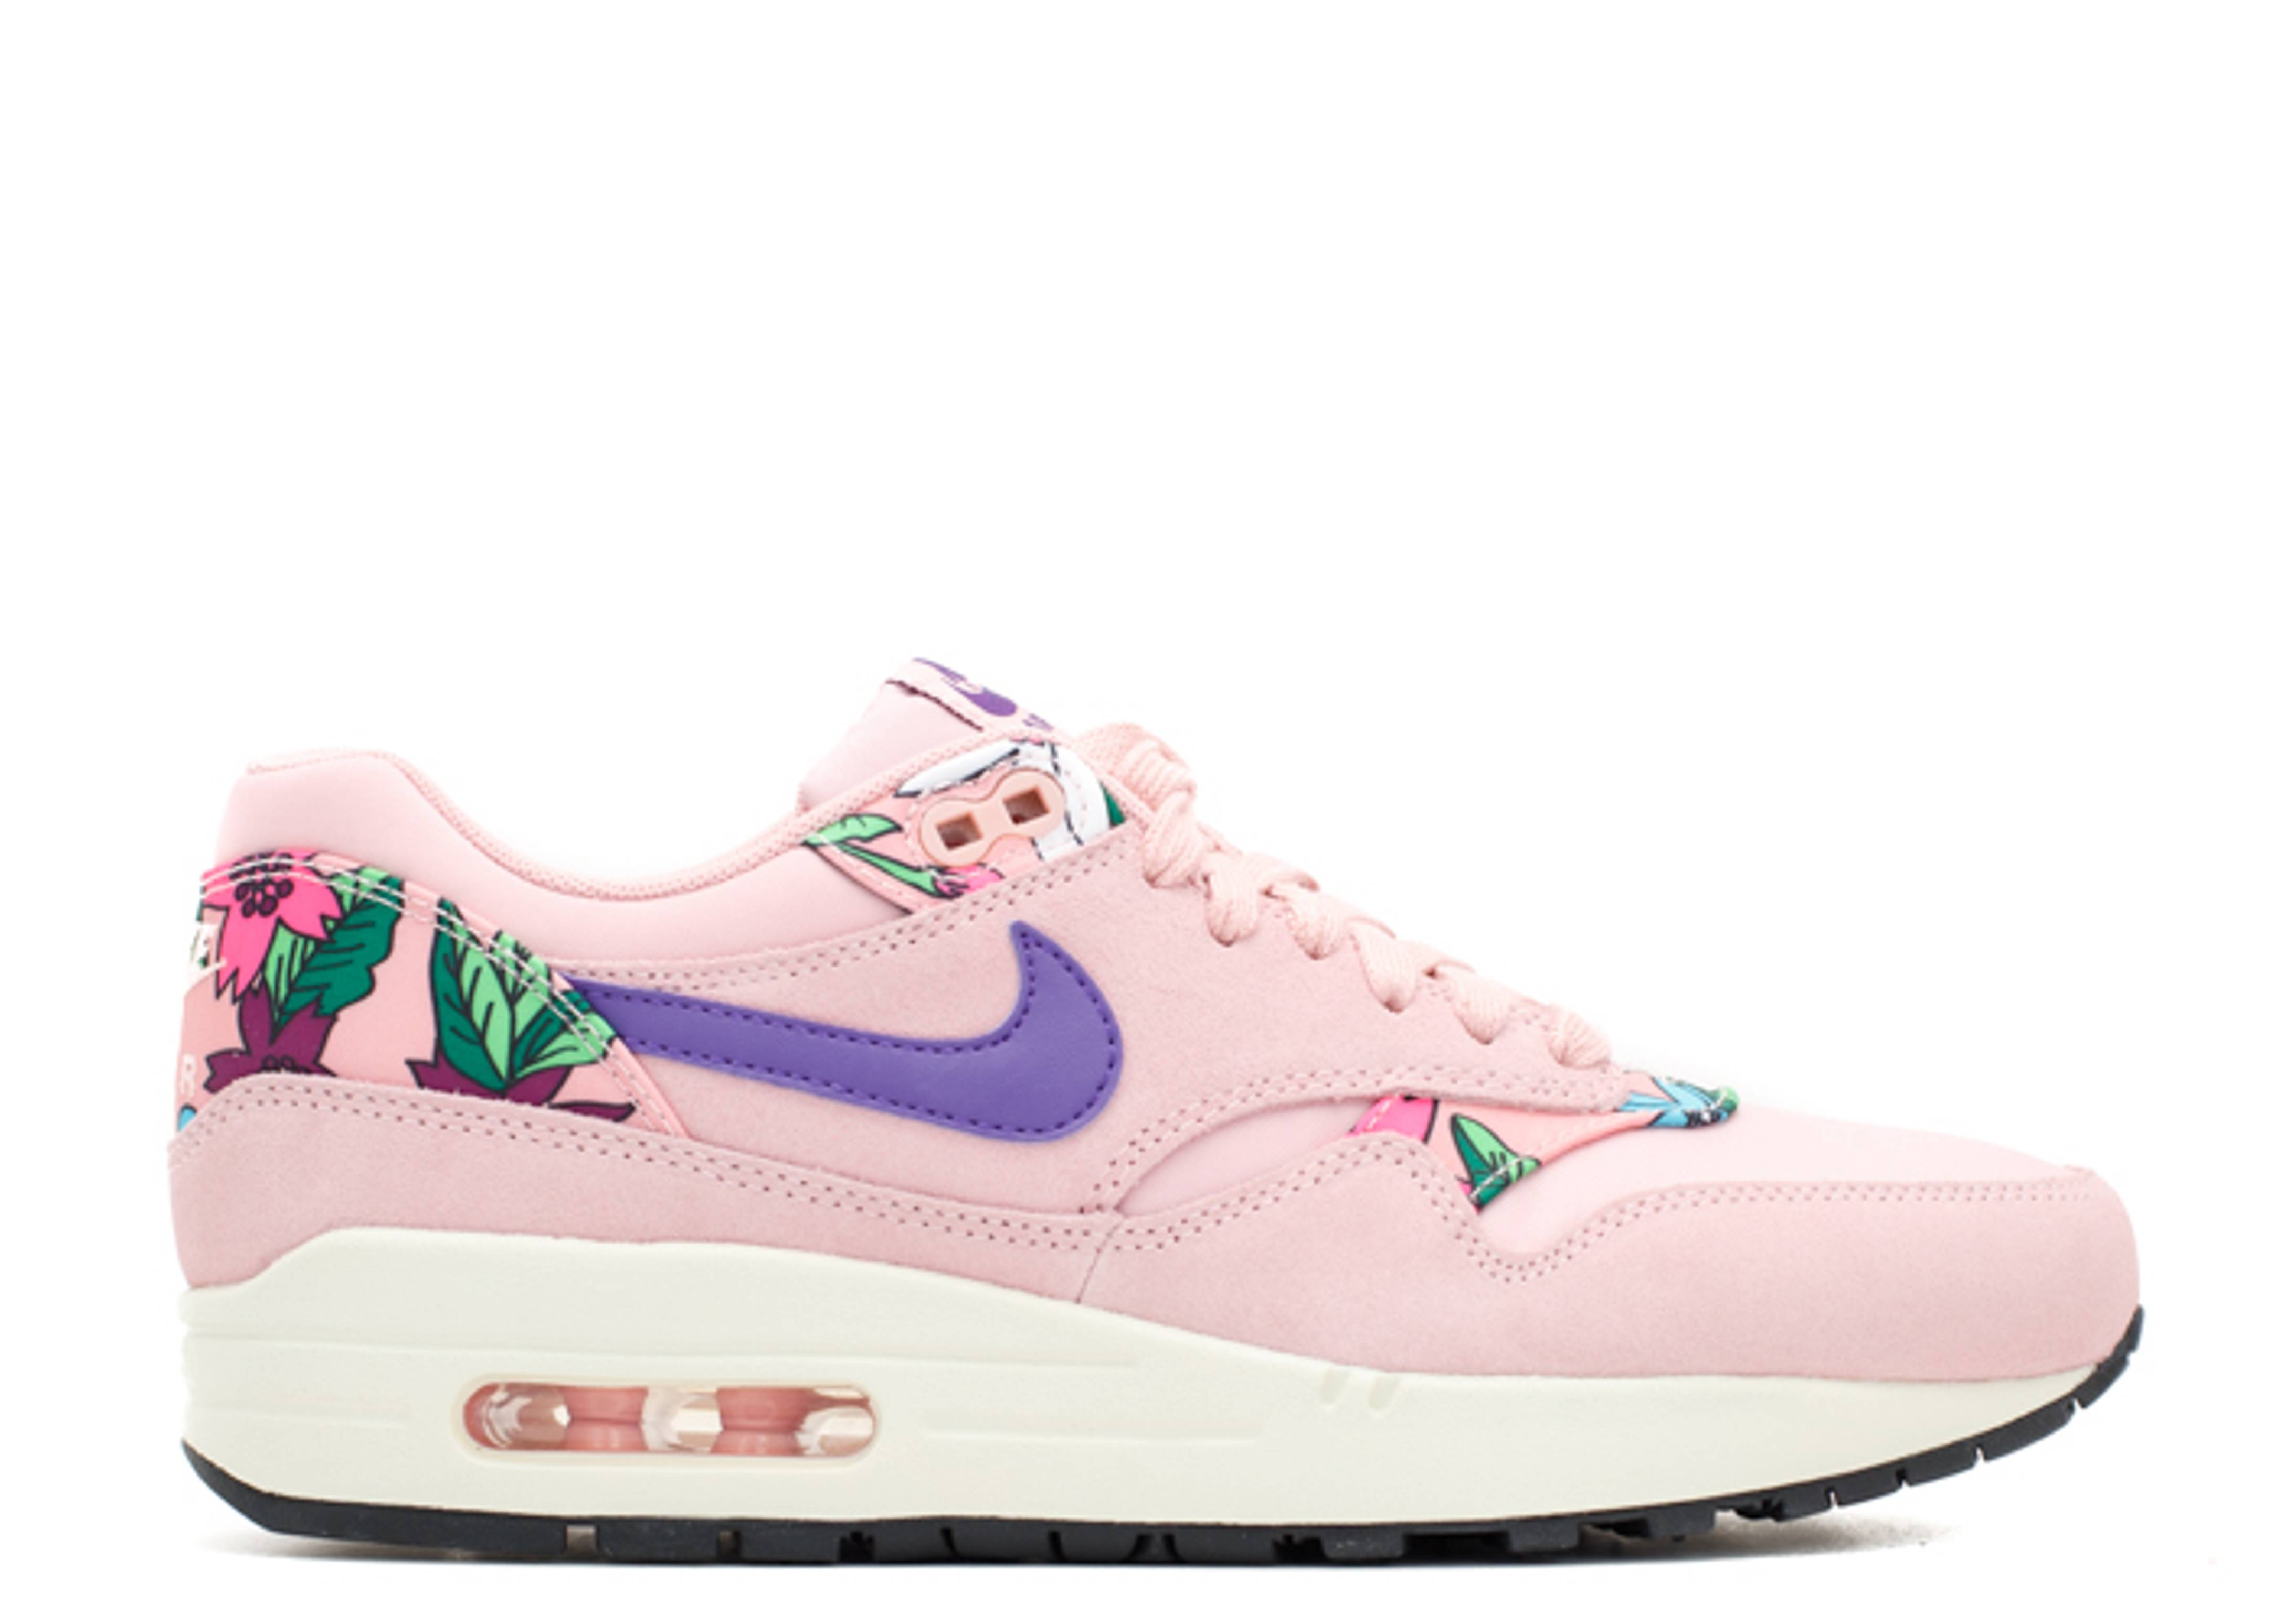 Nike Wmns Air Max 1 Print *Aloha Pack* (Pink Glaze Varsity Purple Sail Black)